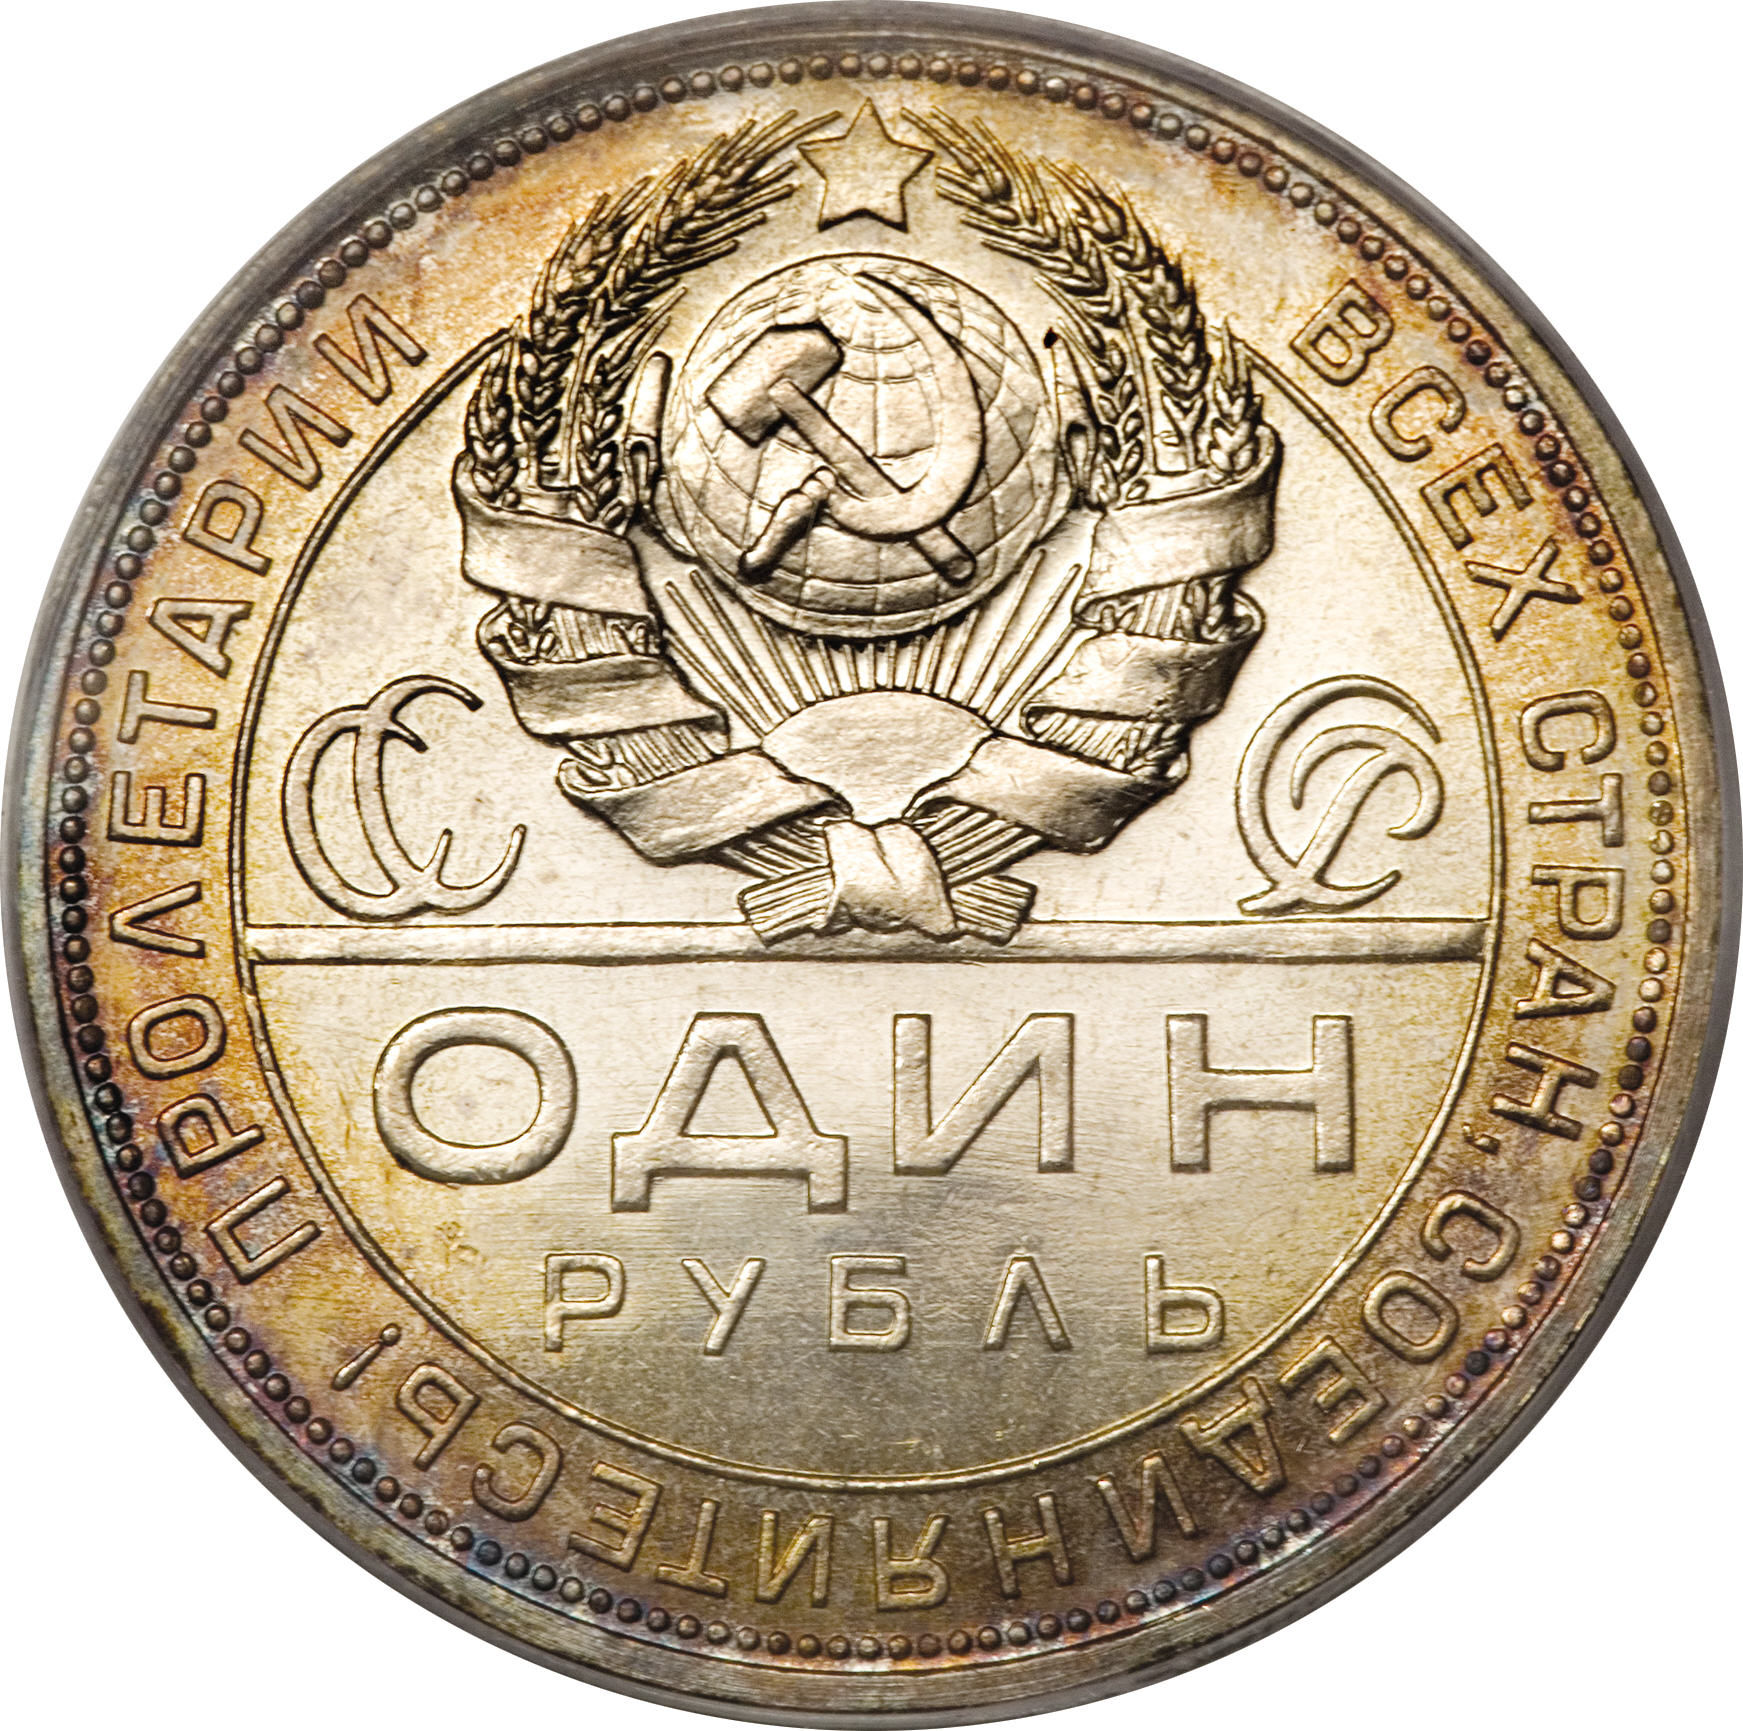 1 ruble soviet union ussr numista